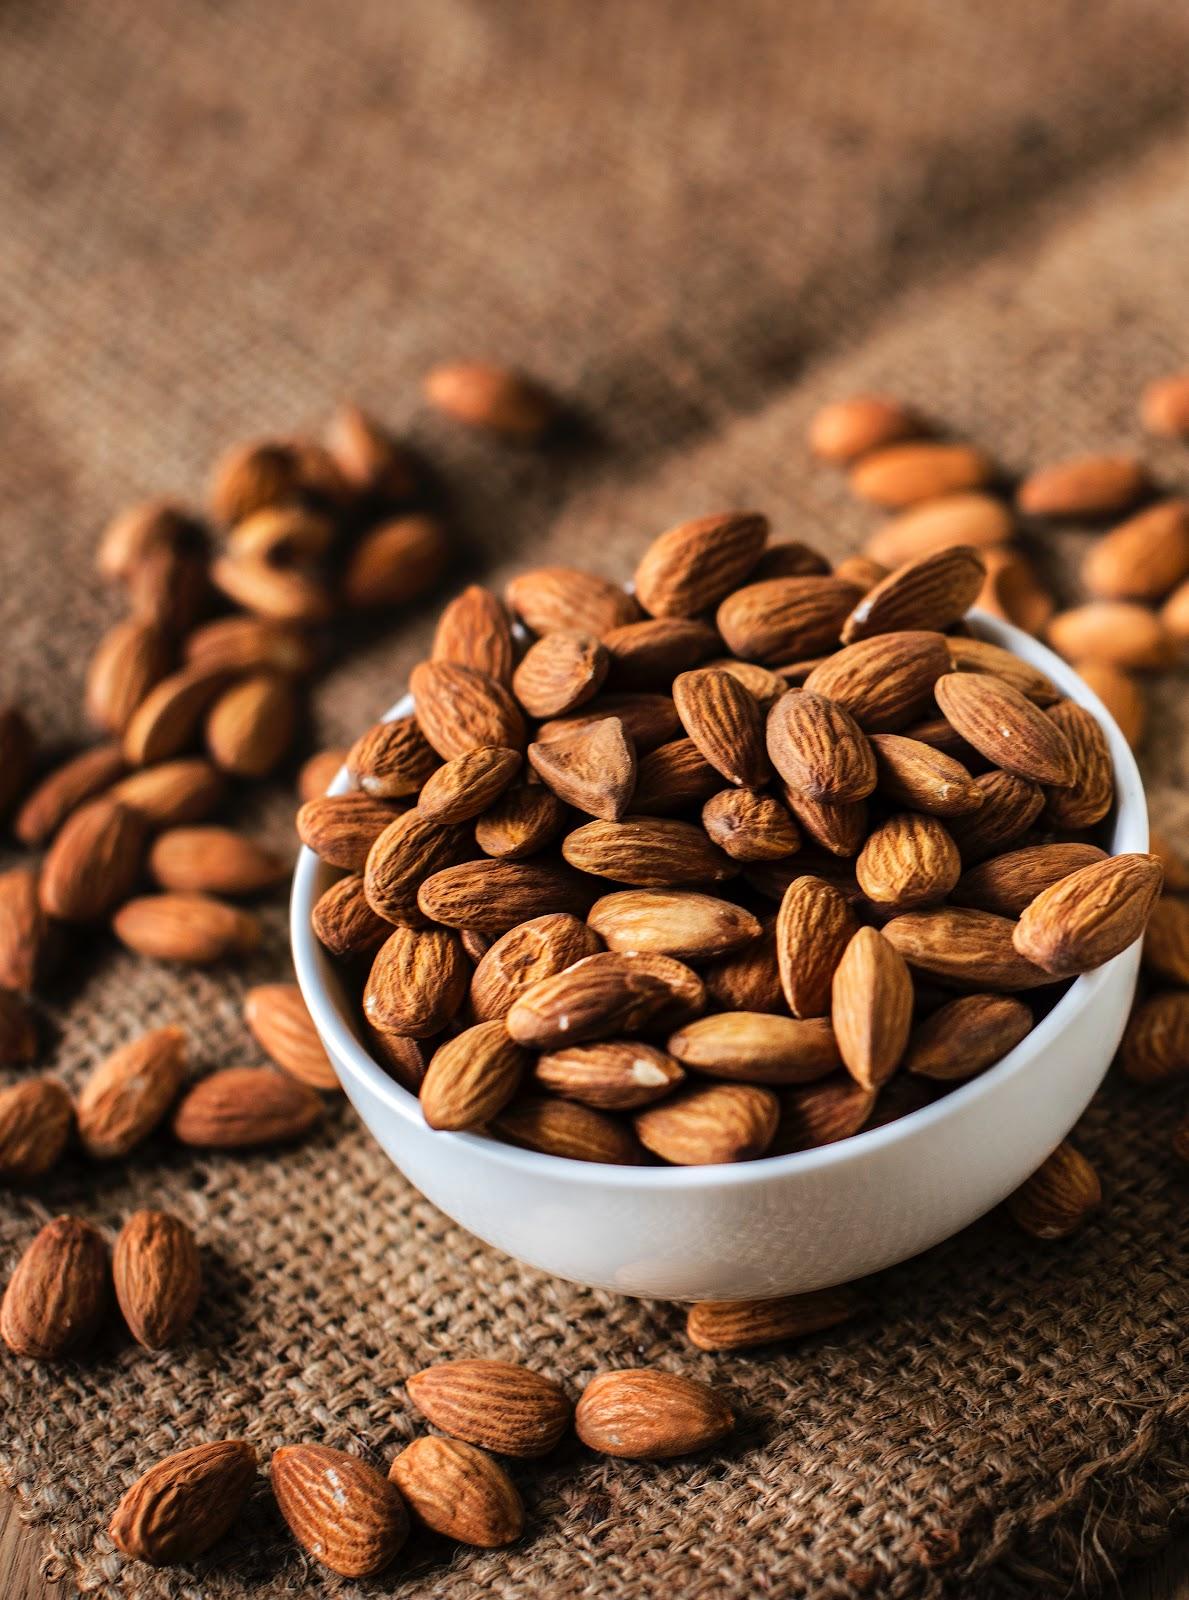 amandes top ingrédient healthy marsemd18